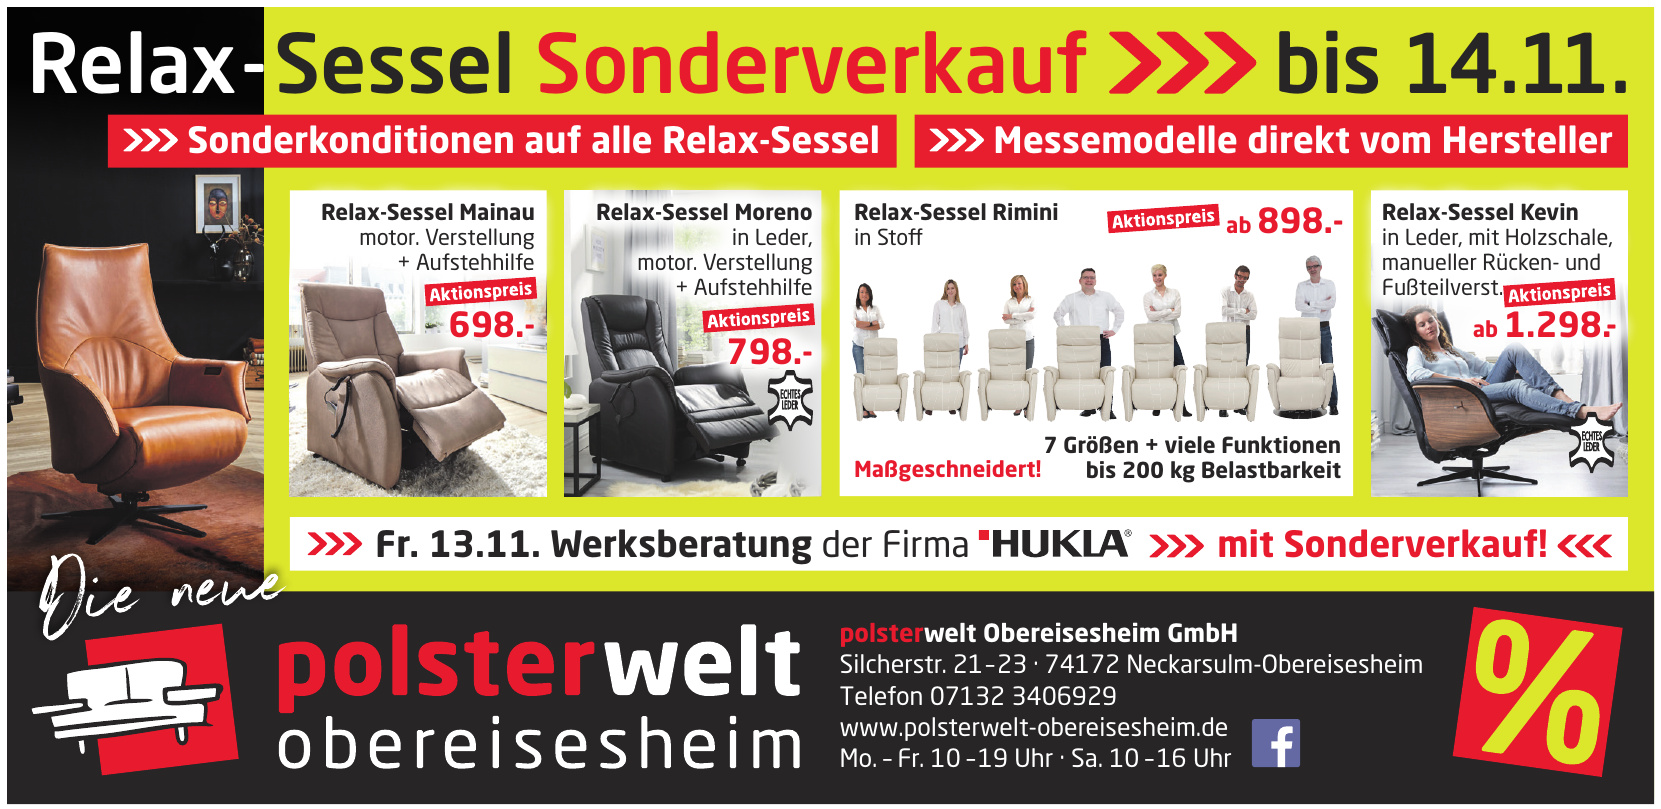 polsterwelt Obereisesheim GmbH